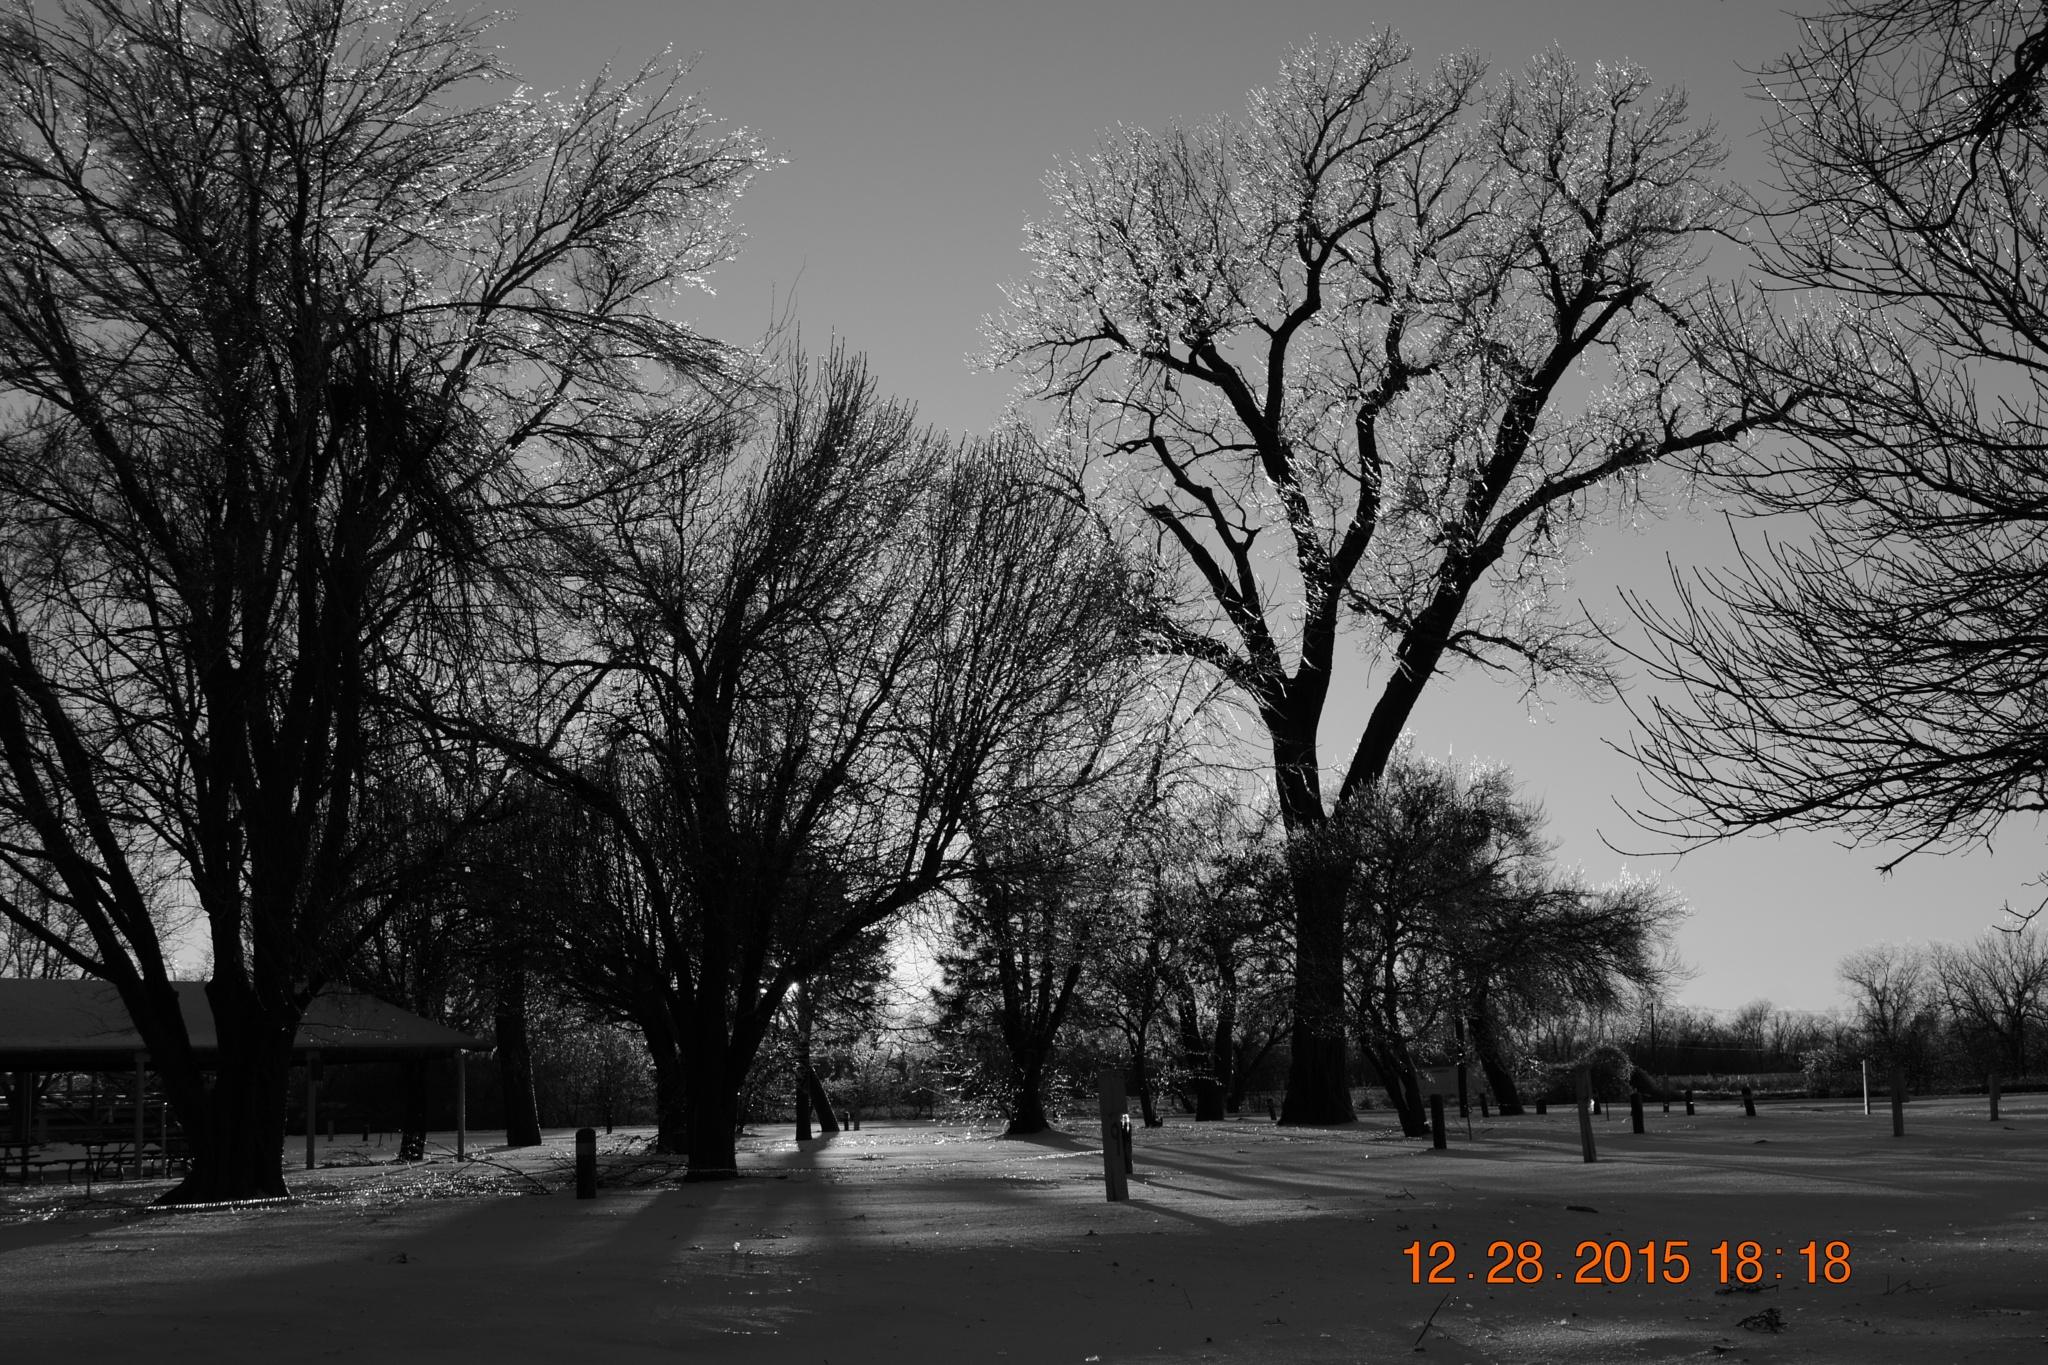 randlet park oklahoma by roughneck1-9